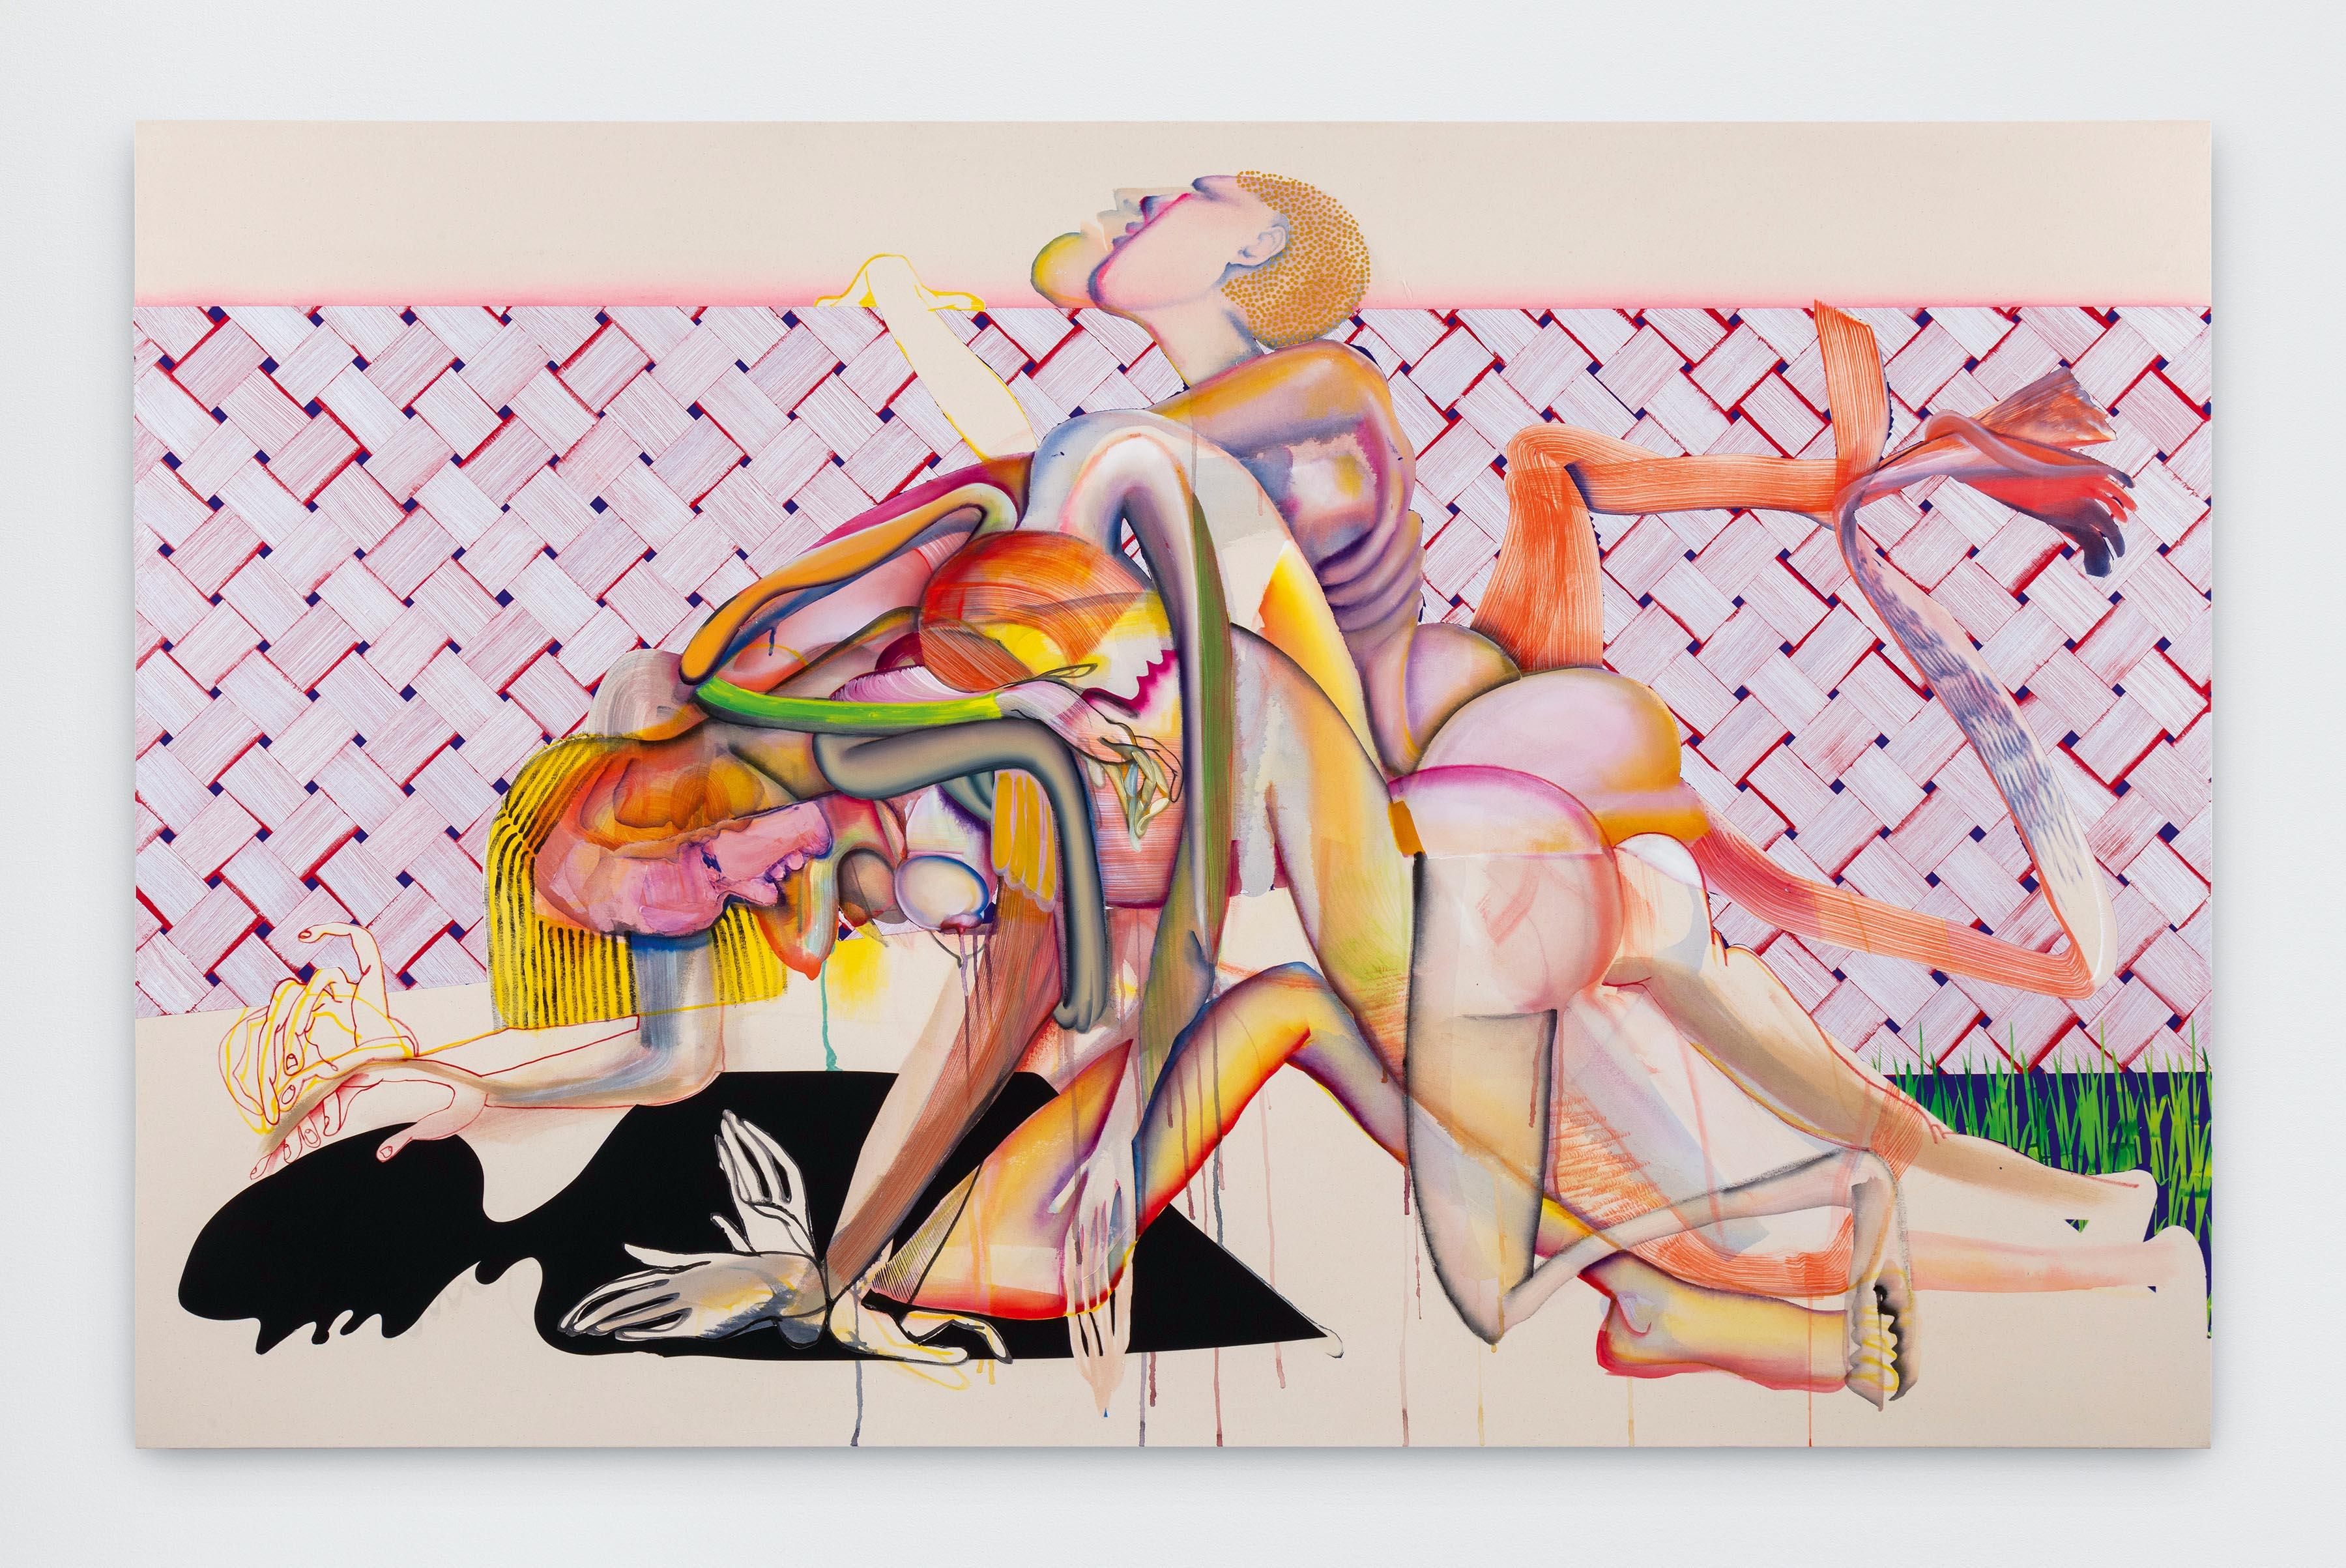 """Peer Amid"" (Peered Amidst) [2019], de Christina Quarles, acrylique sur toile, 139,7 x 218,4 x 5,1 cm."